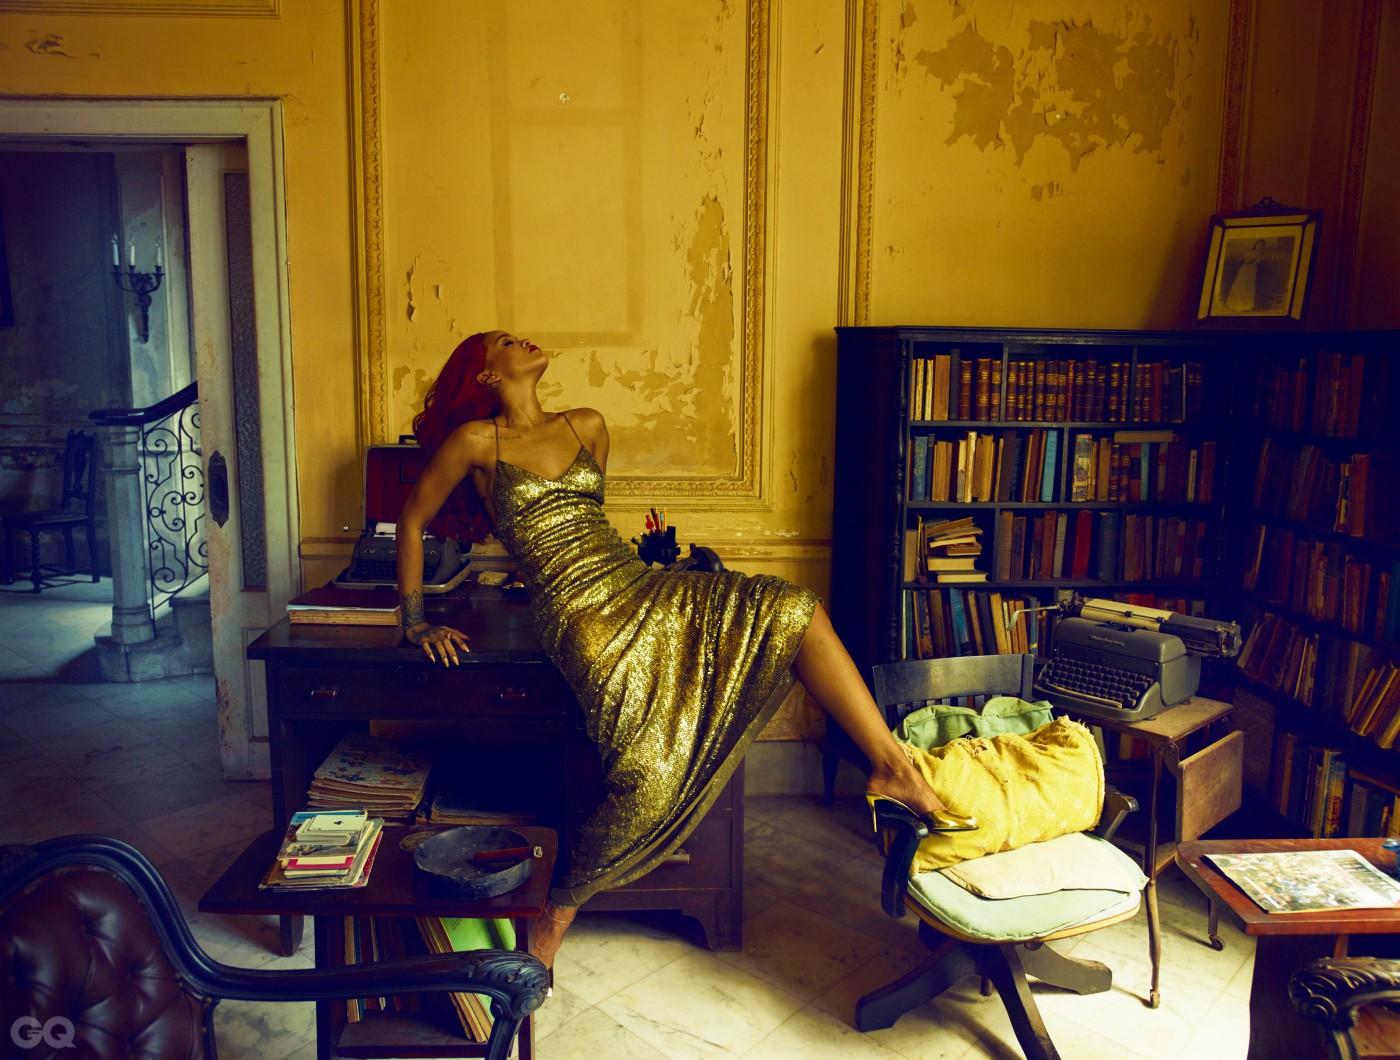 RUN THIS GOWN          Rihanna takes a break in the Josie Alonso House, on Calzada Street, in Havana's Vedado neighborhood.